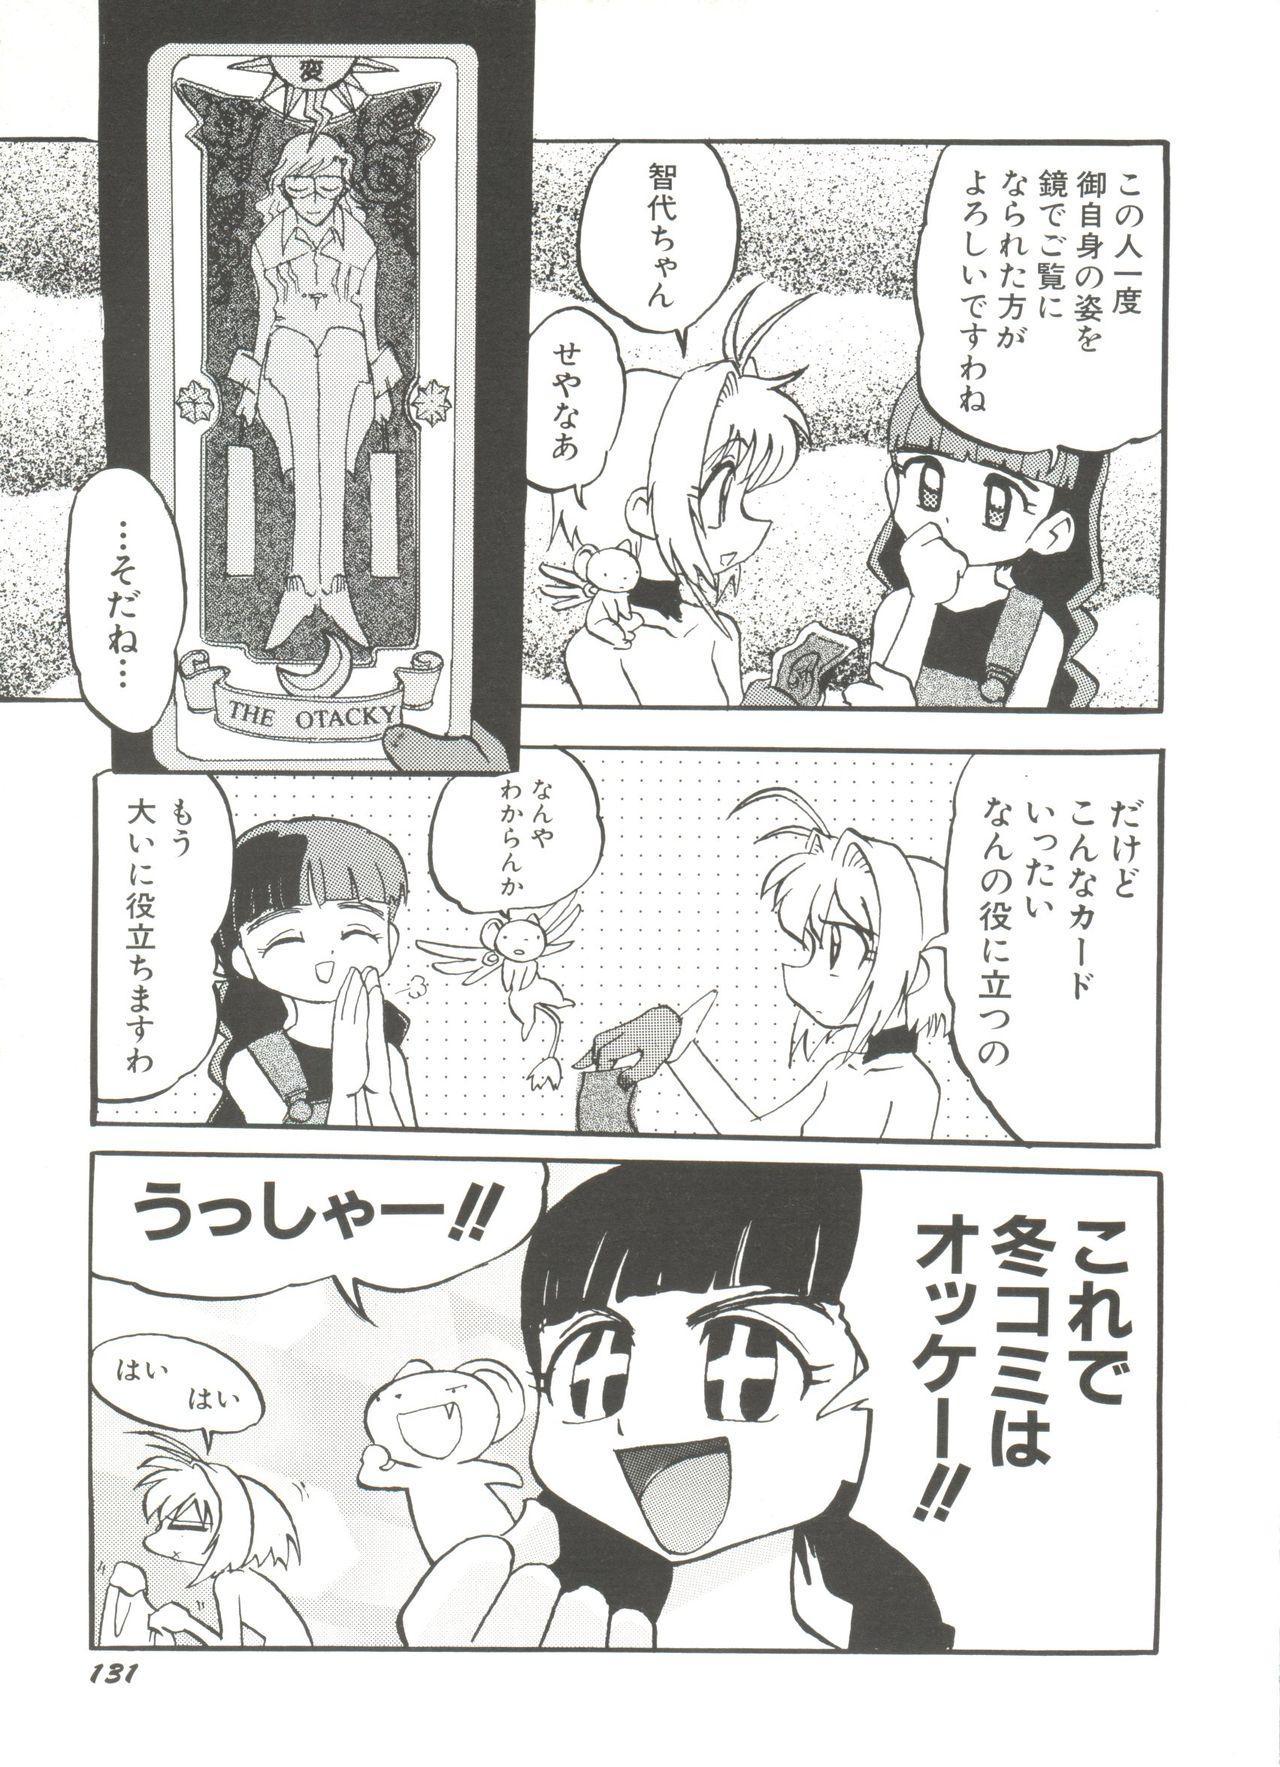 [Anthology] Denei Tamatebako 8 - Utakata no Tenshi-tachi II (Various) 132